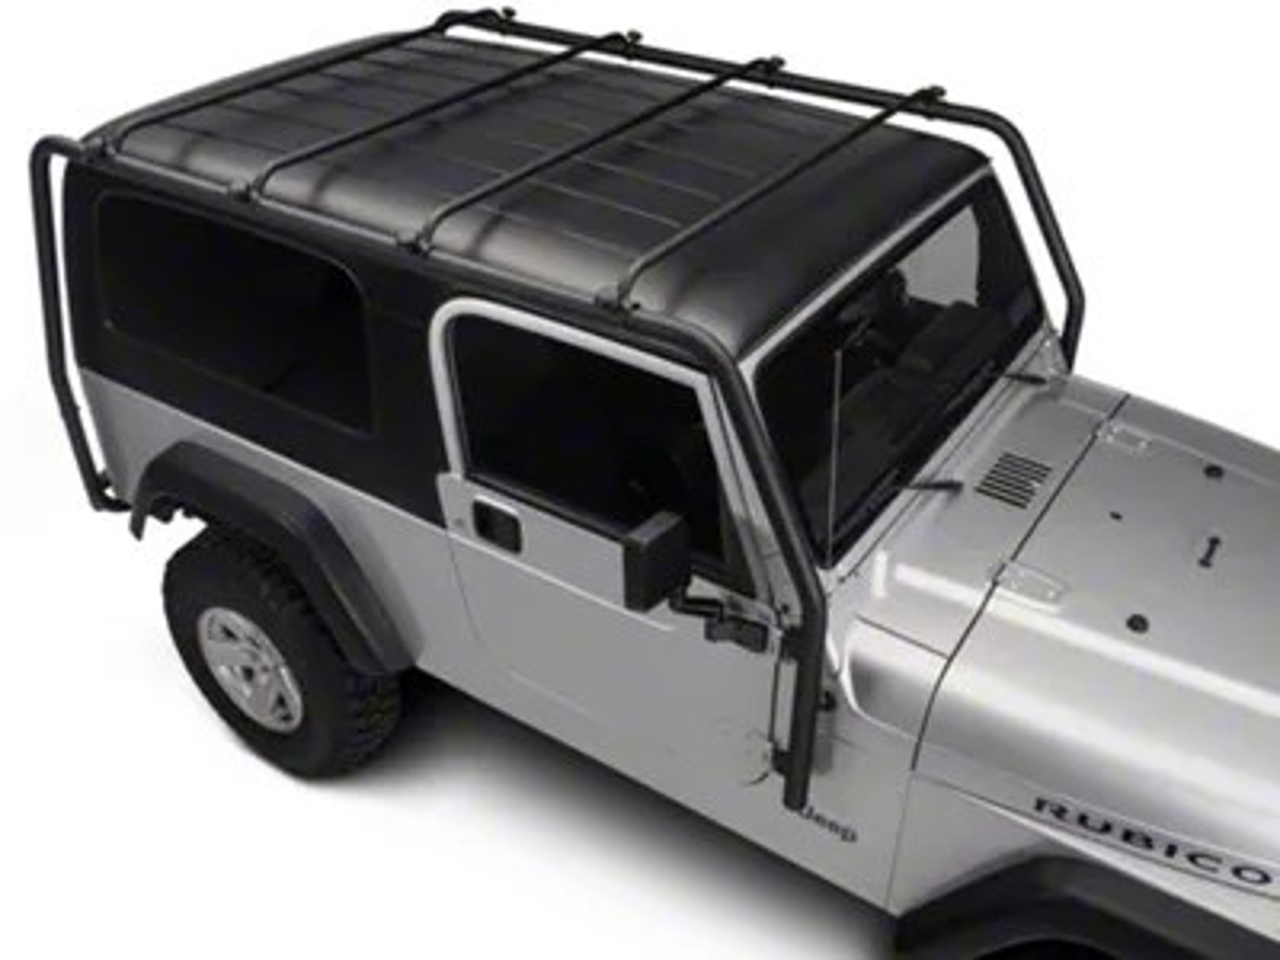 barricade roof rack textured black 04 06 jeep wrangler tj unlimited